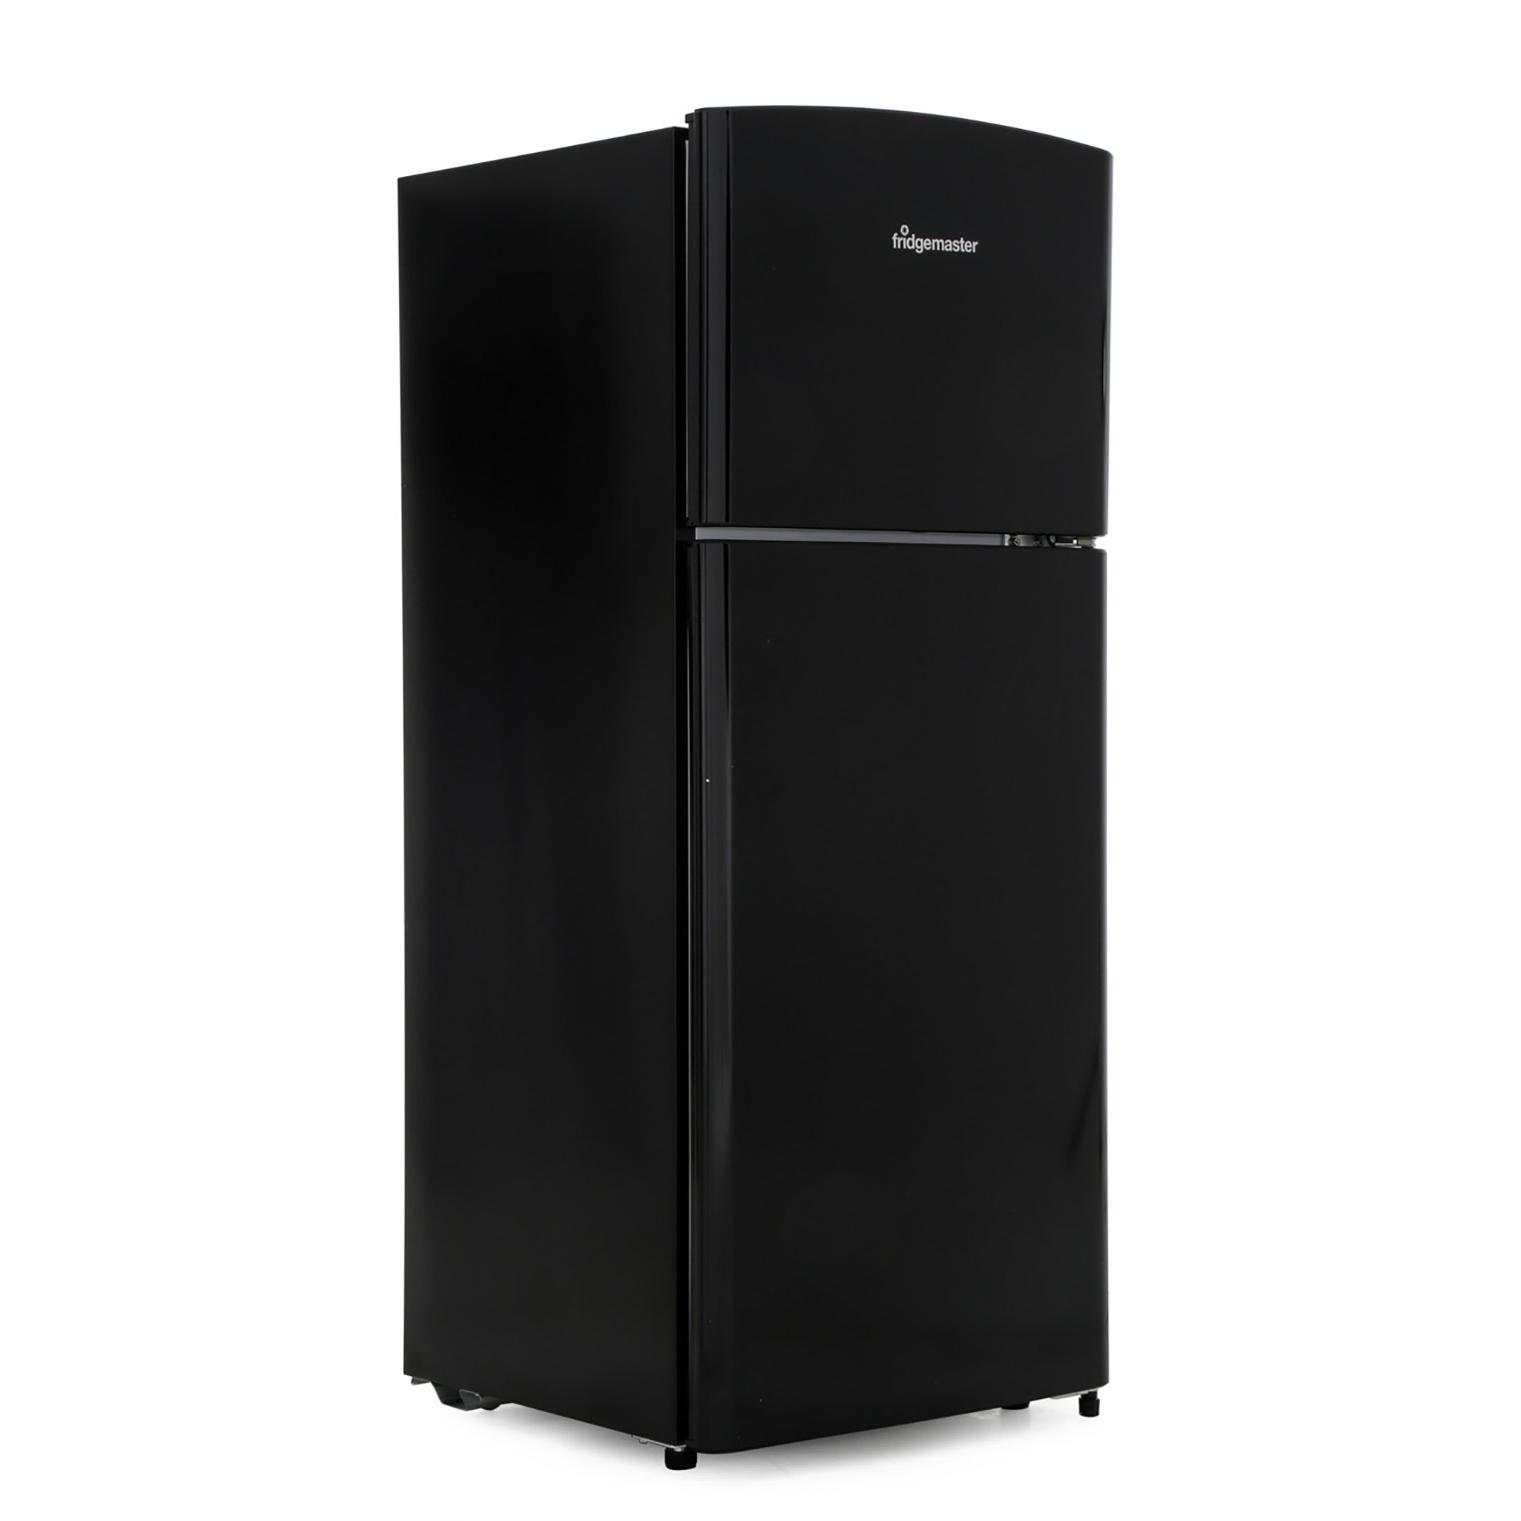 Fridgemaster MTM48120B Fridge Freezer